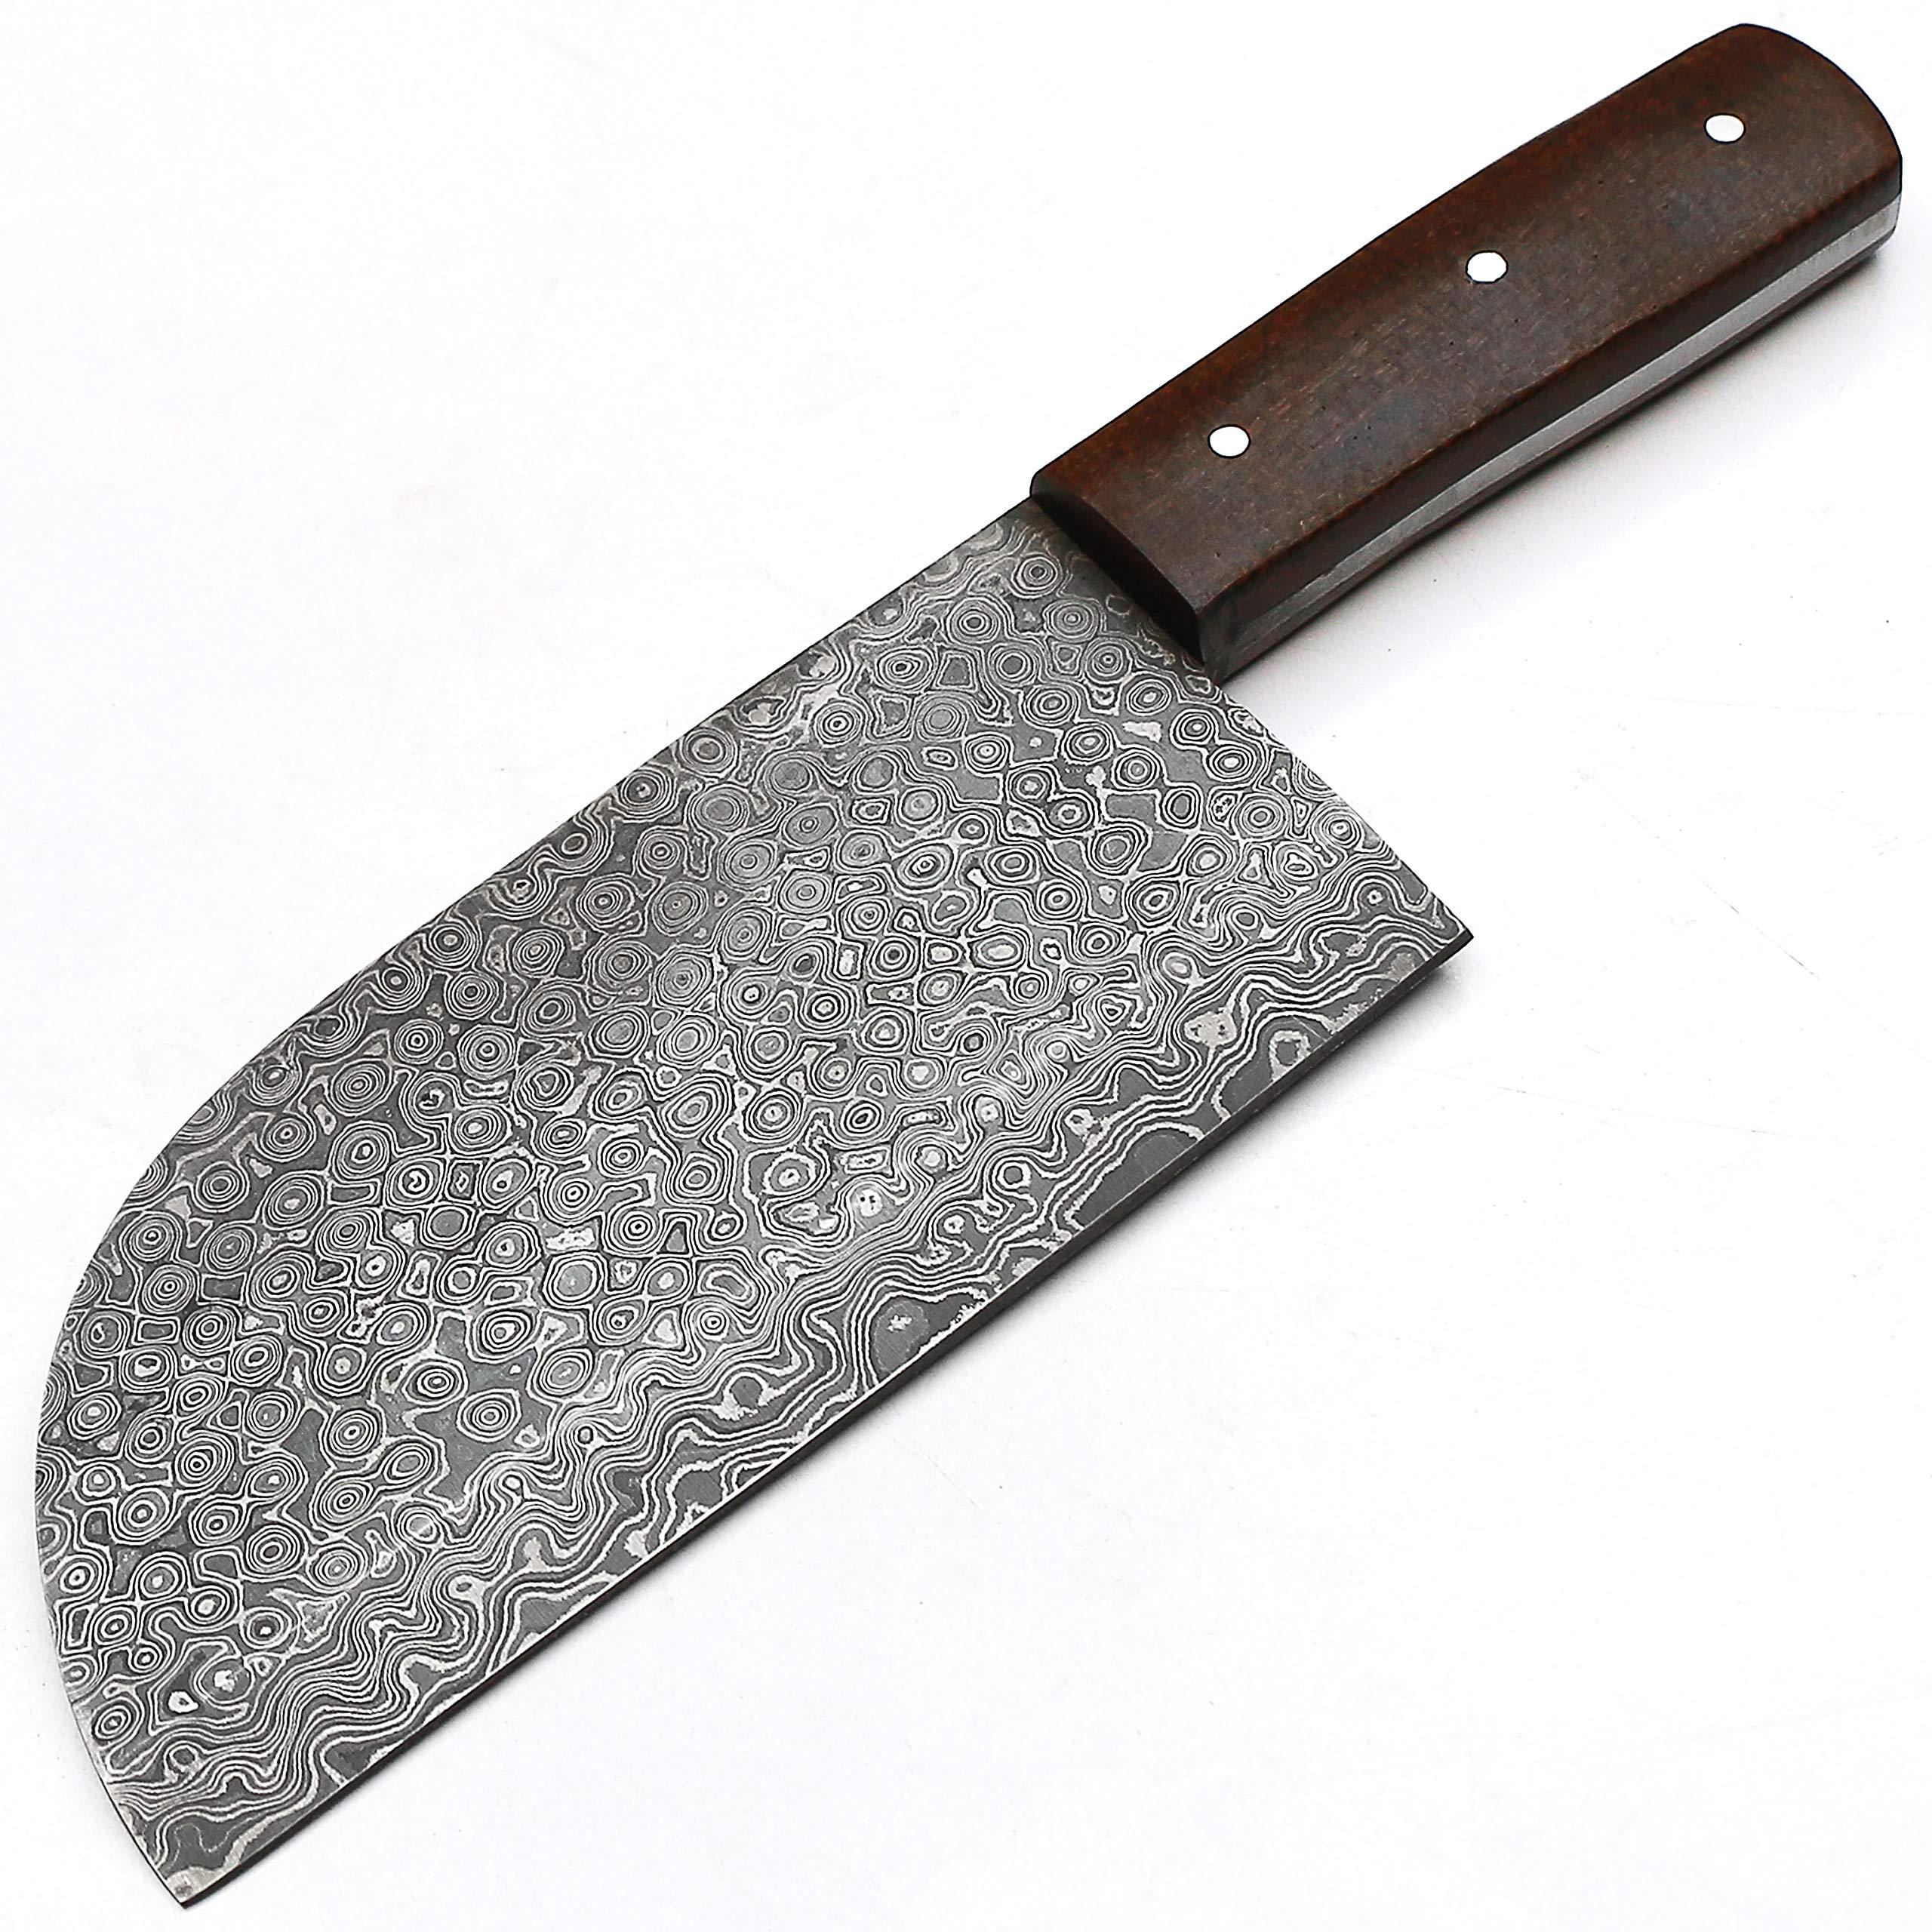 Full Tang Custom Handmade Damascus Steel Hunting Chef Cleaver Knife -Sword/Chef Kitchen Knife/Dagger/Skinner/Axe/Billet/Bar/Folding Knife/Kukri/knives accessories/survival/Camping With Sheath 8666